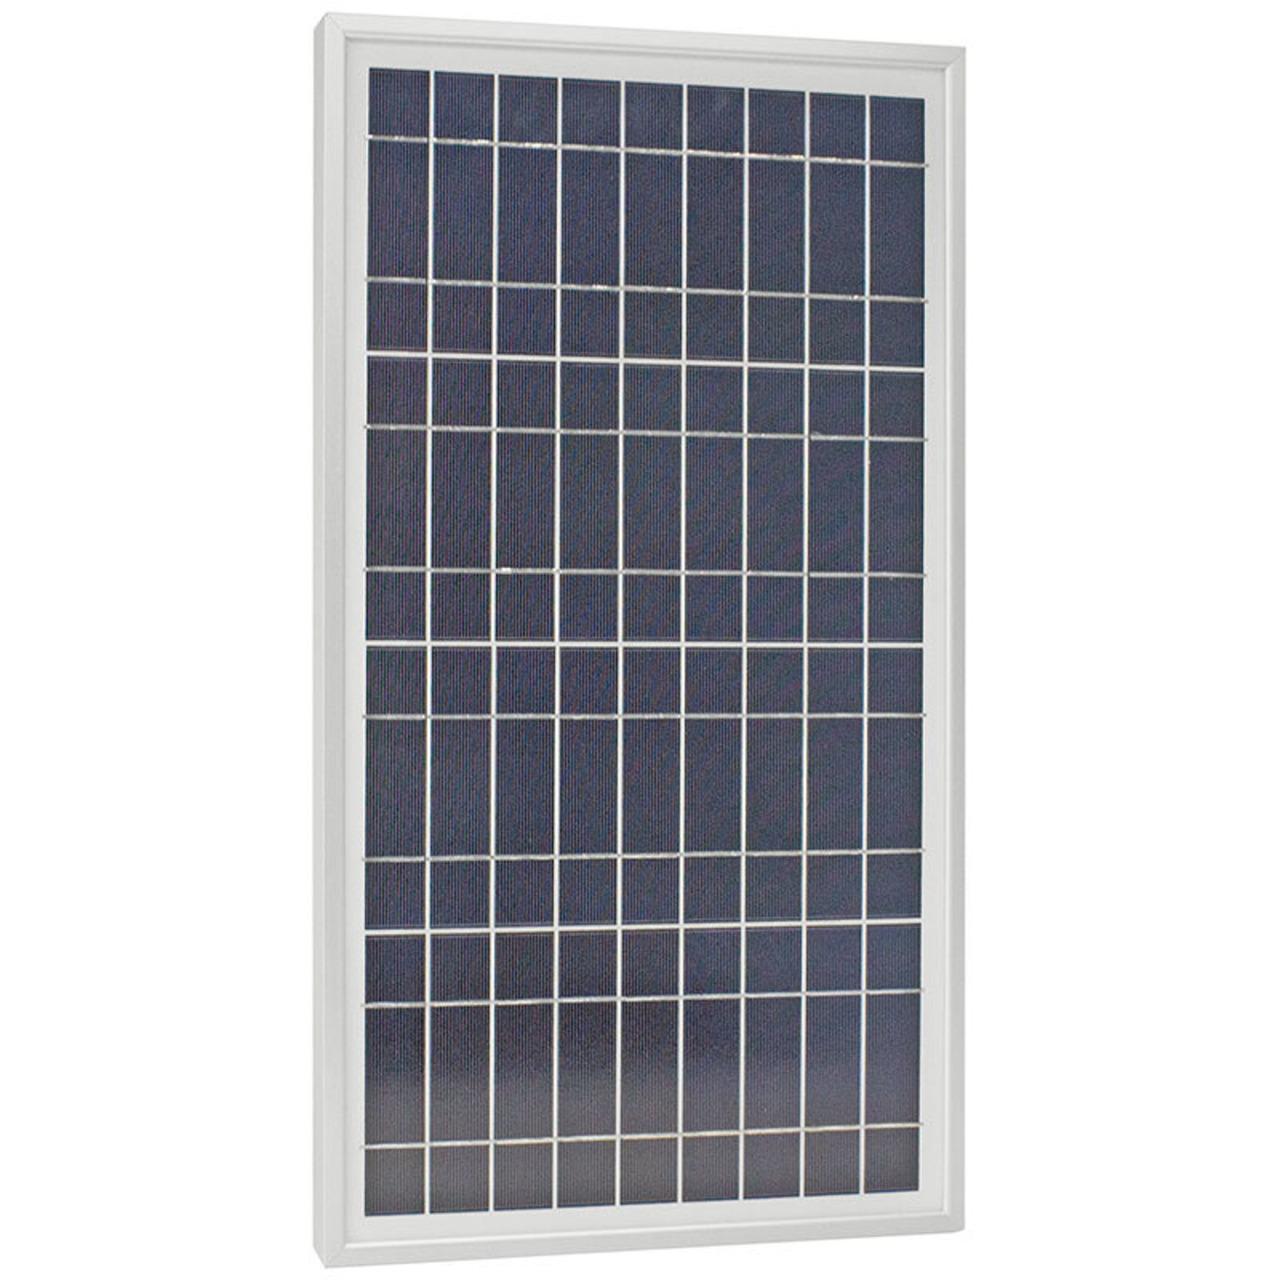 Phaesun Monokristalline Solarmodul Sun Plus 20 S, 12 V, 20 W